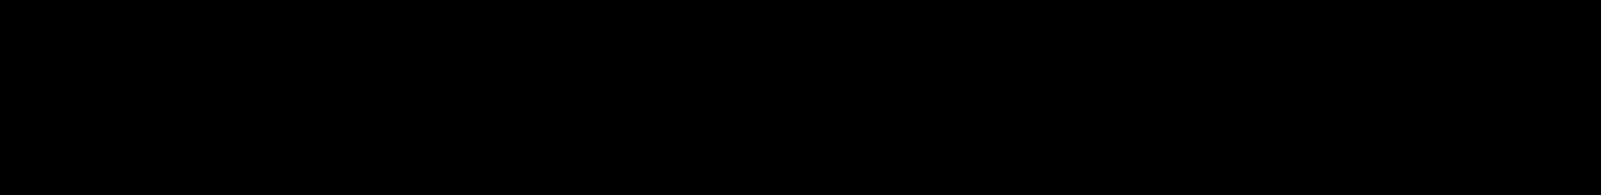 https://davespicer.com.au/wp-content/uploads/sites/749/2019/12/Someone-Logo-BLACK.png